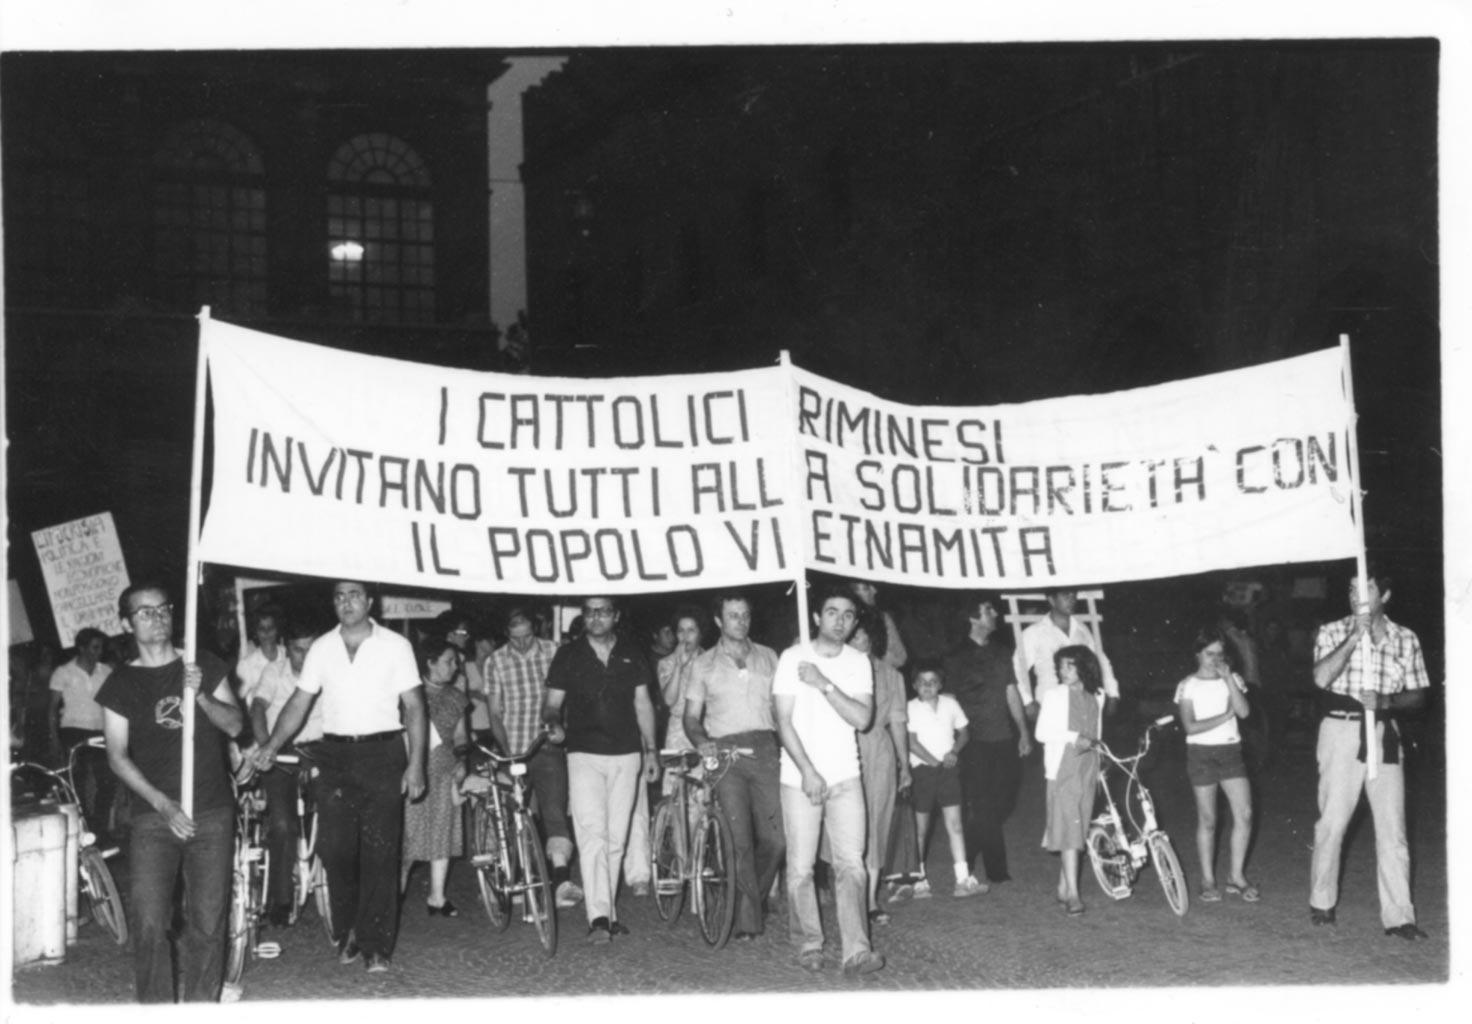 cattolici-riminesi